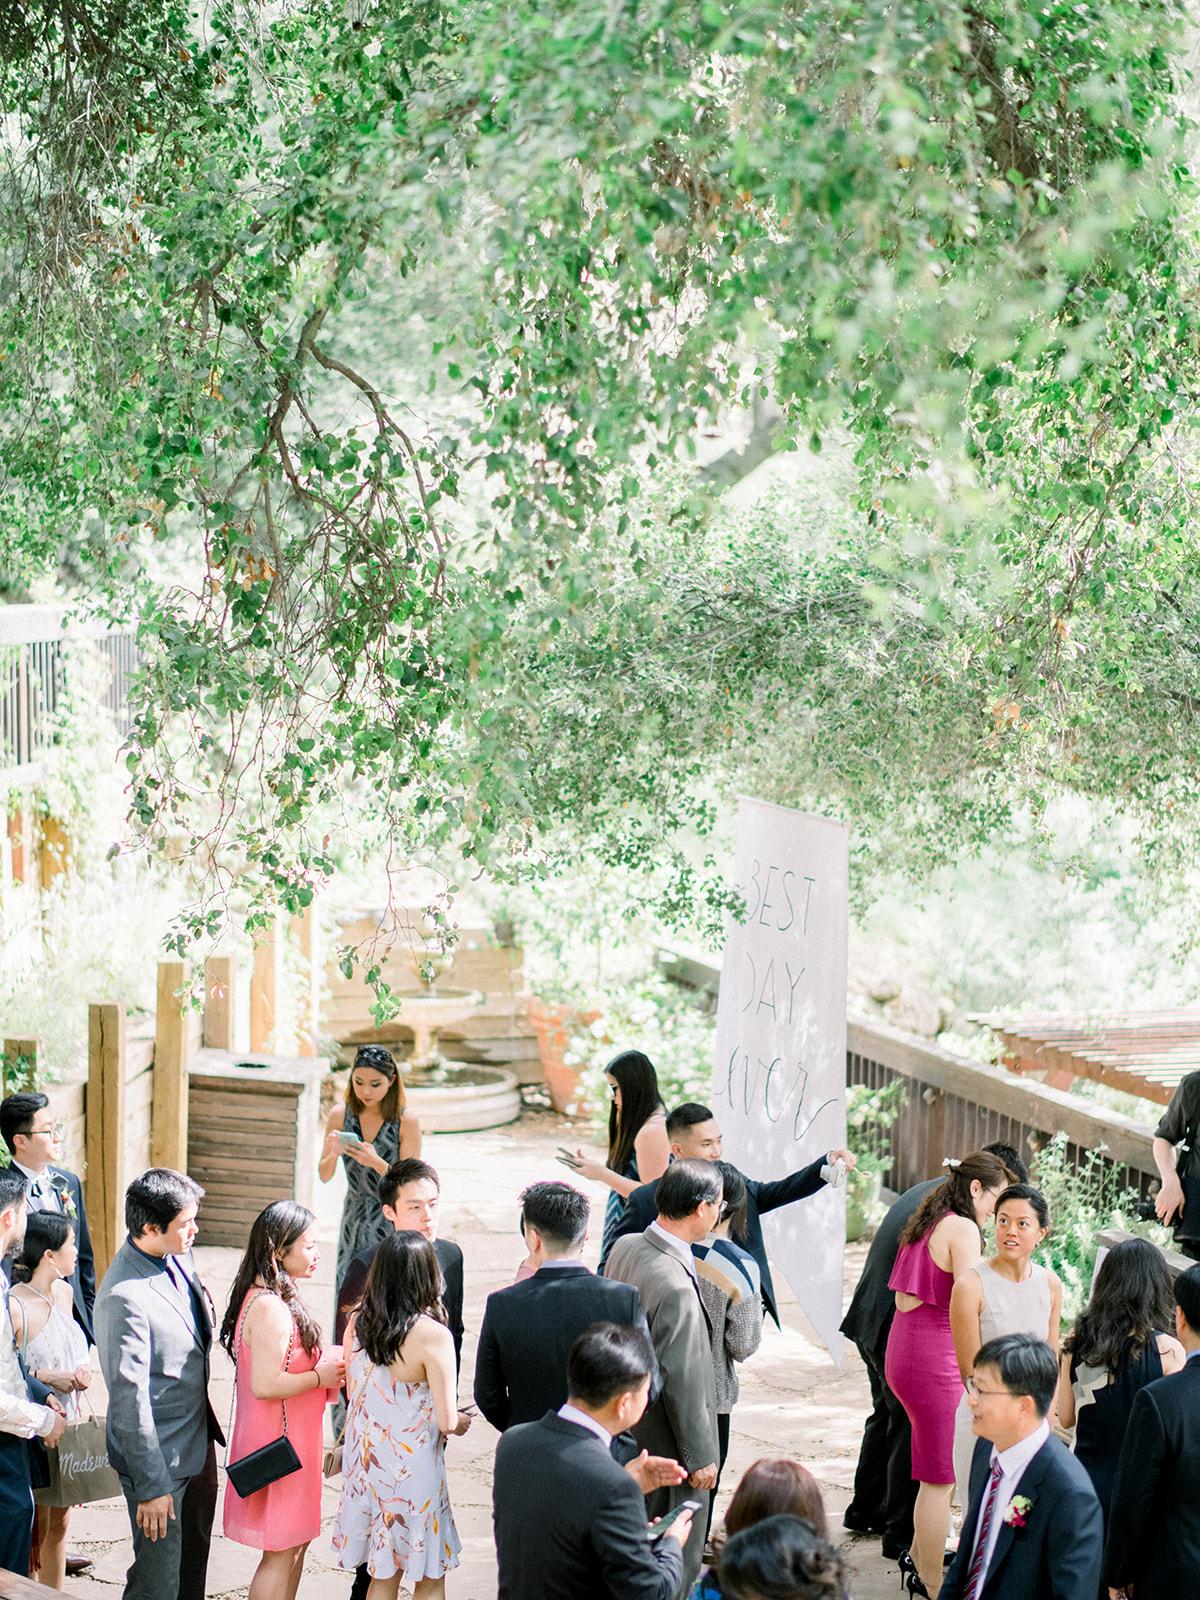 jueunandjon-etherandsmith-wedding-611.jpg